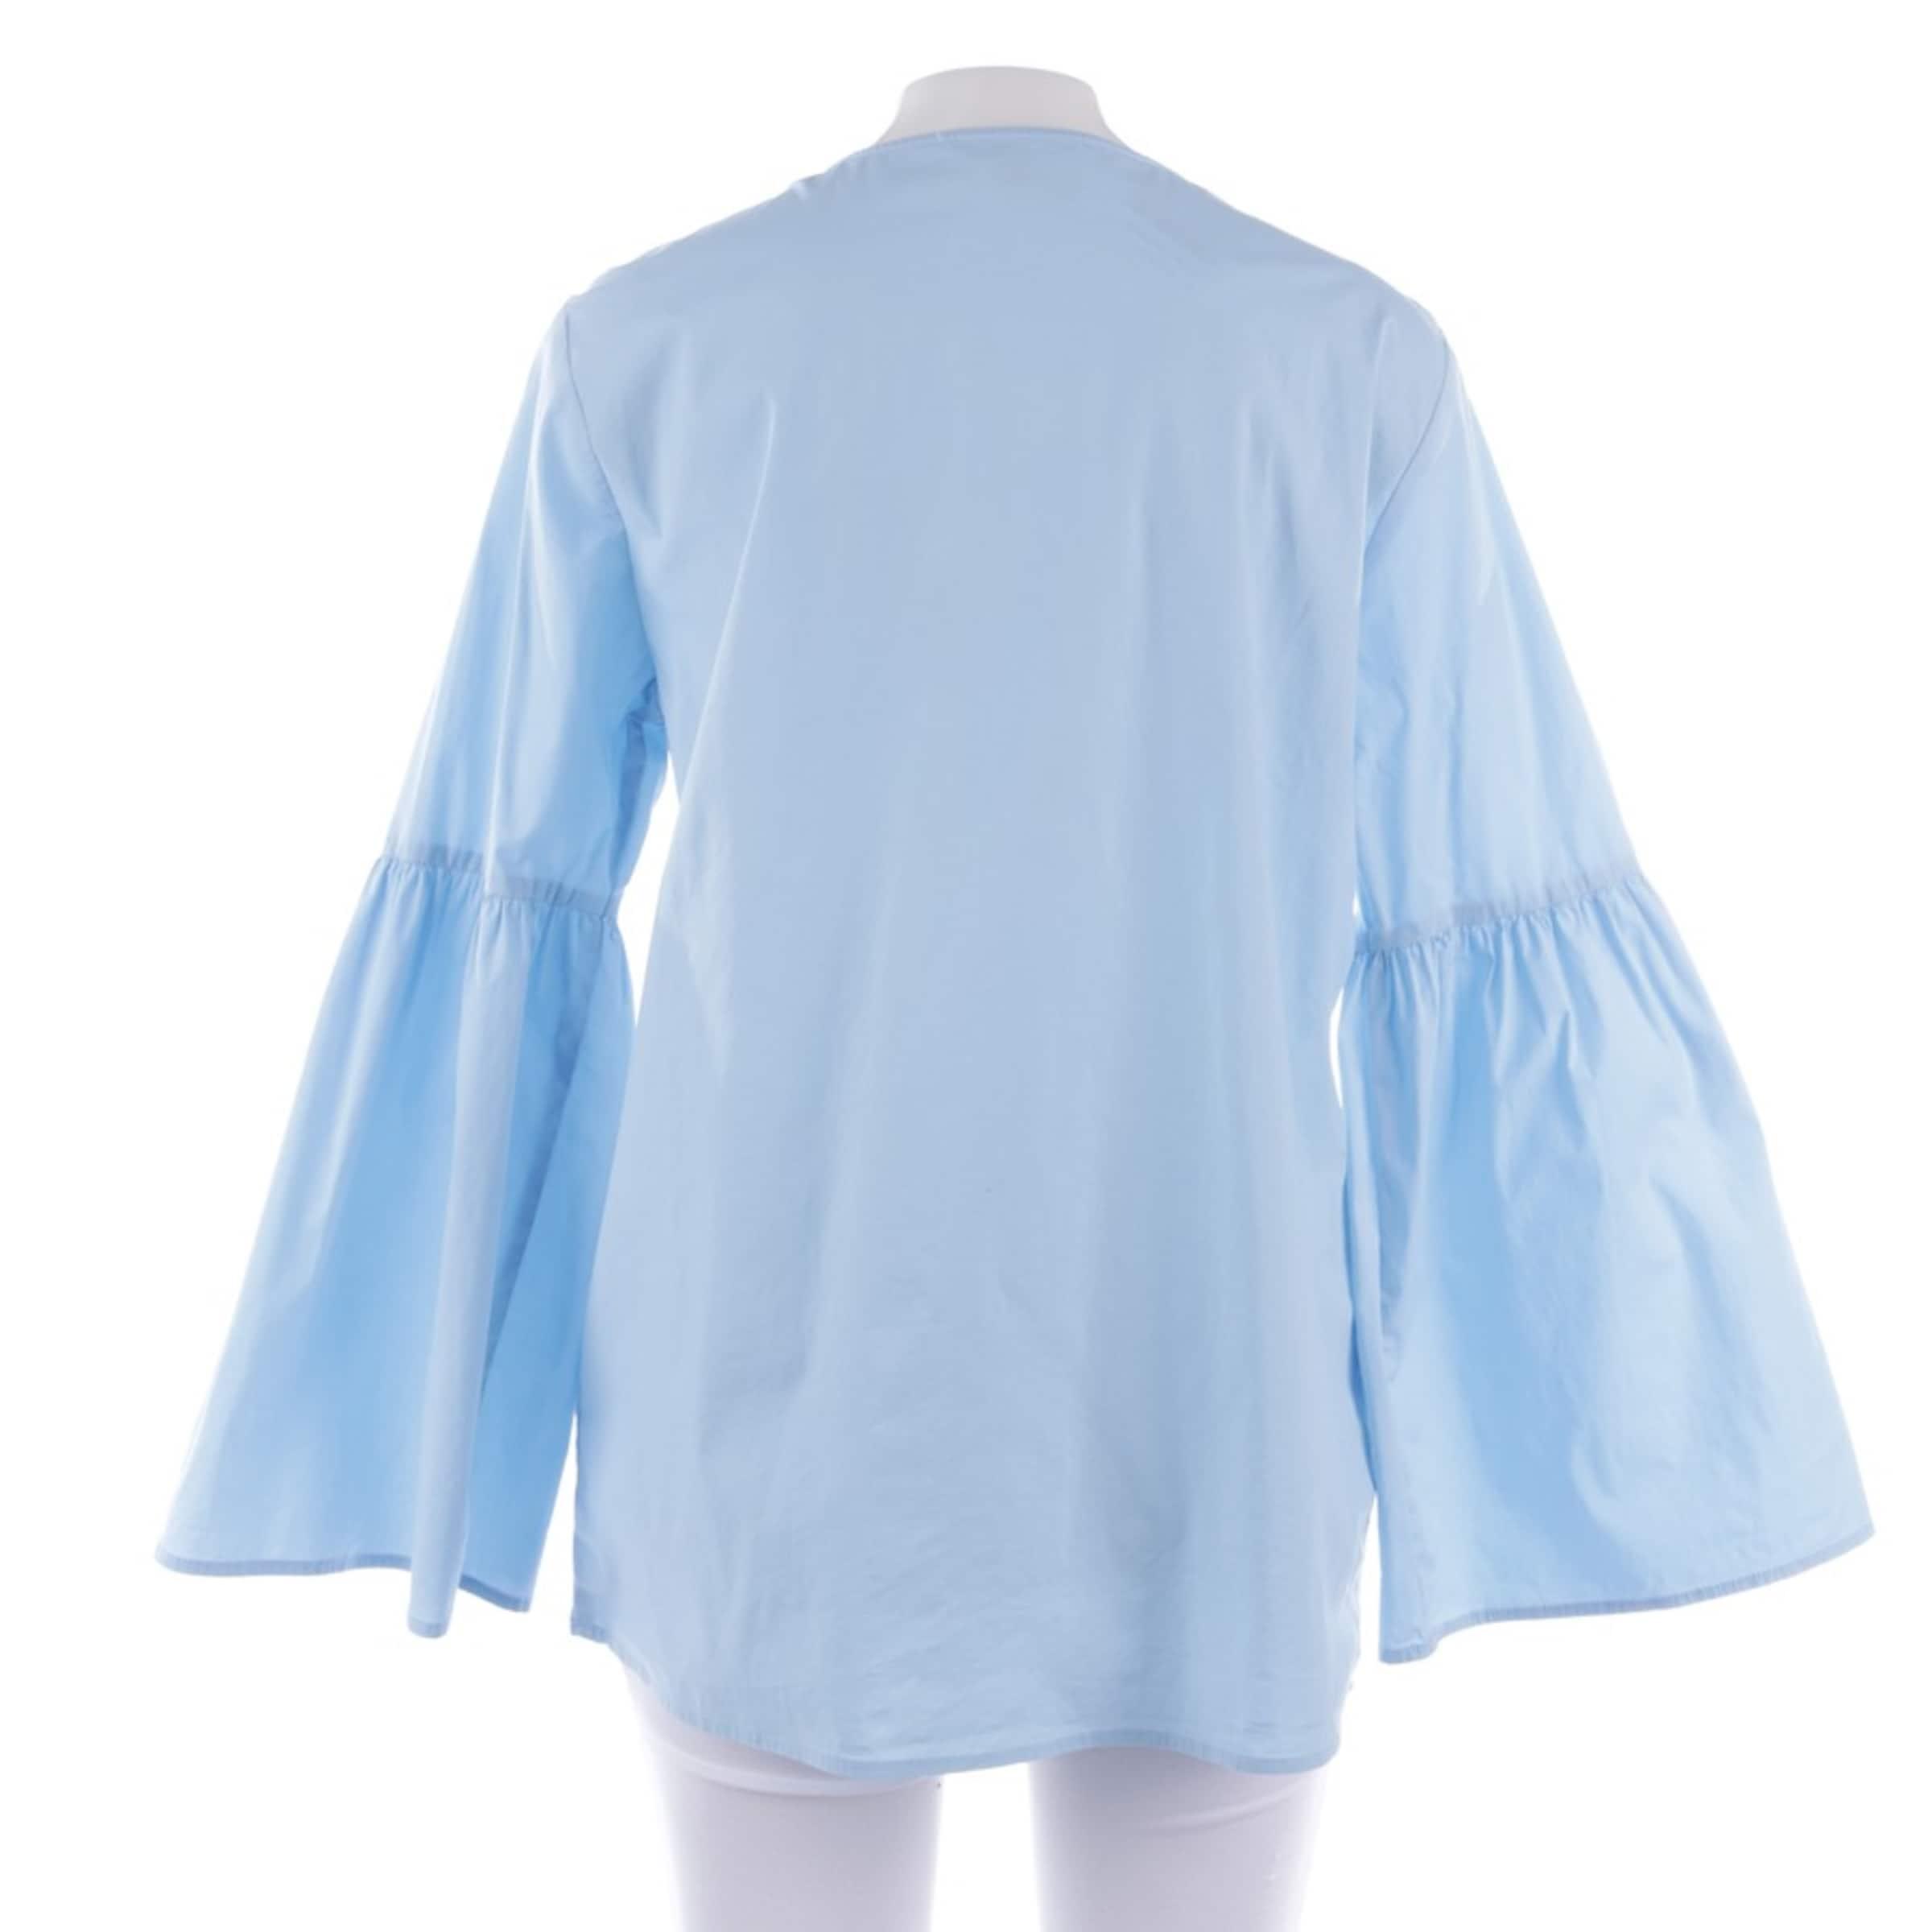 Michael Kors Bluse  in himmelblau